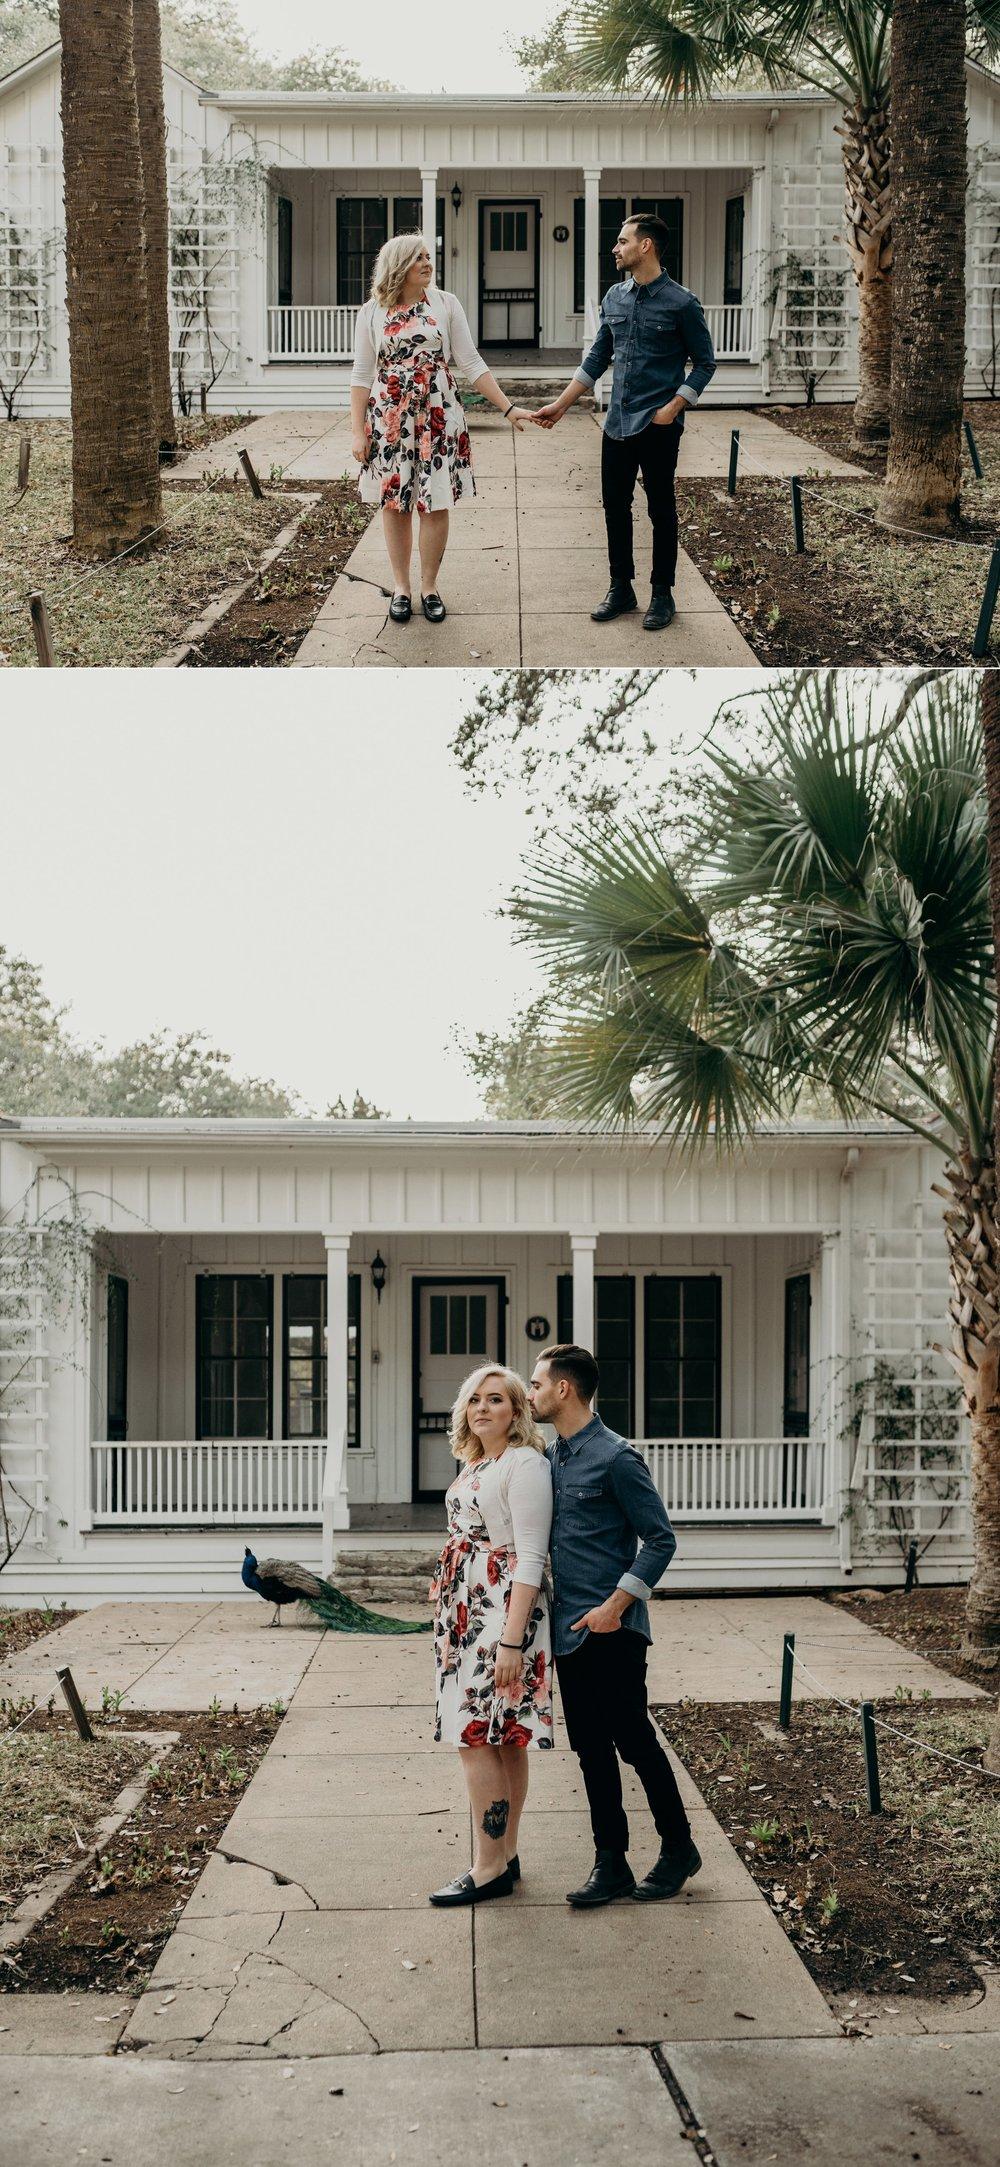 drew-andrew-texas-austin-minnesota-minneapolis-wedding-photographer-destination-elopement-intimate-adventurous_0109.jpg